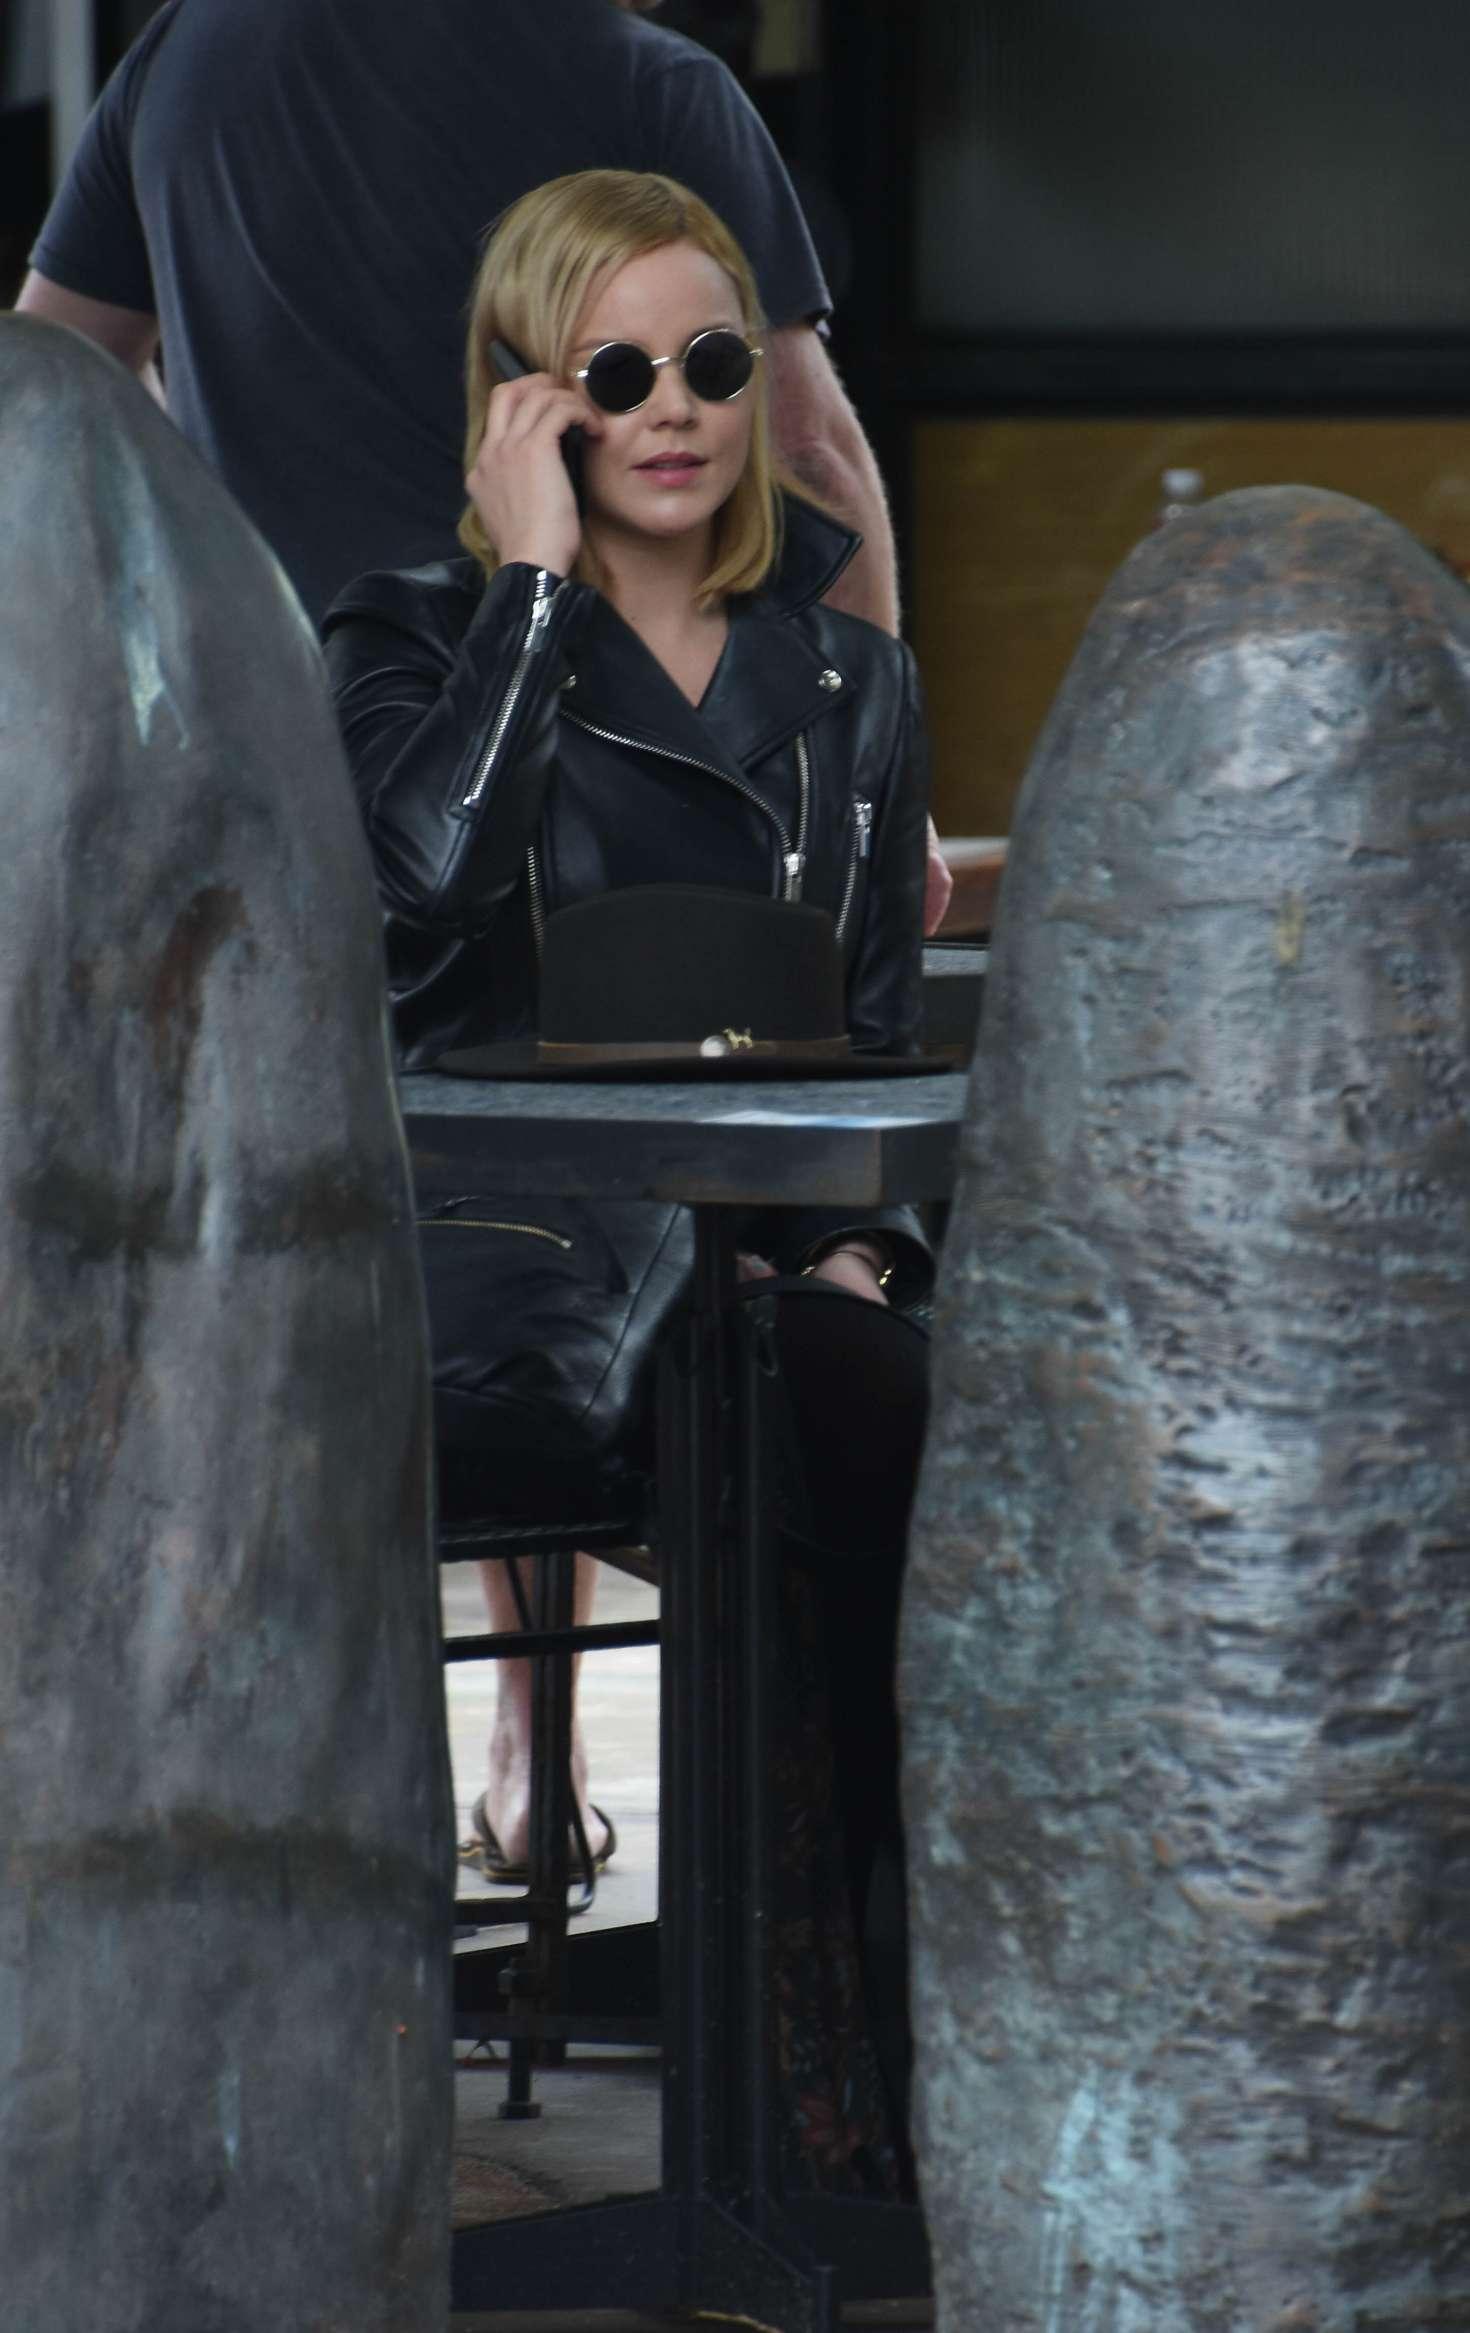 Abbie Cornish 2016 : Abbie Cornish in Long Dress arrives in Sydney -13